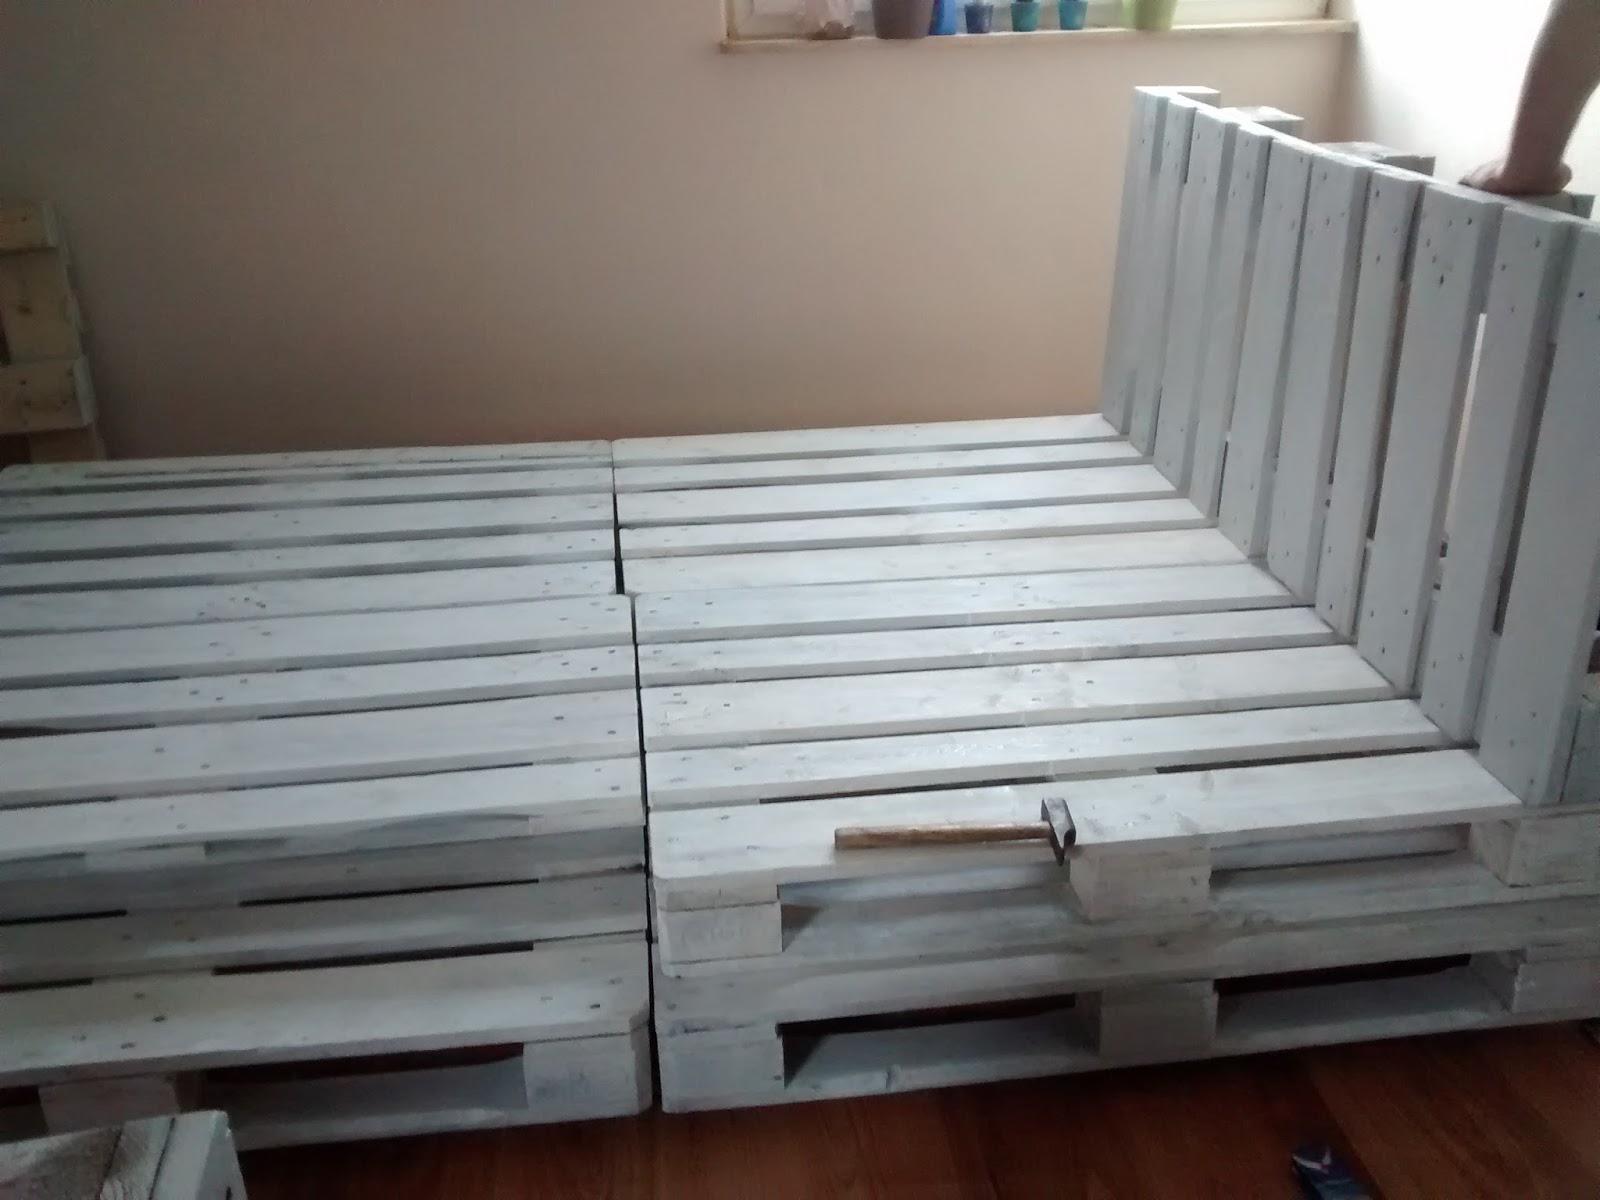 wandregal wei mit k rben. Black Bedroom Furniture Sets. Home Design Ideas